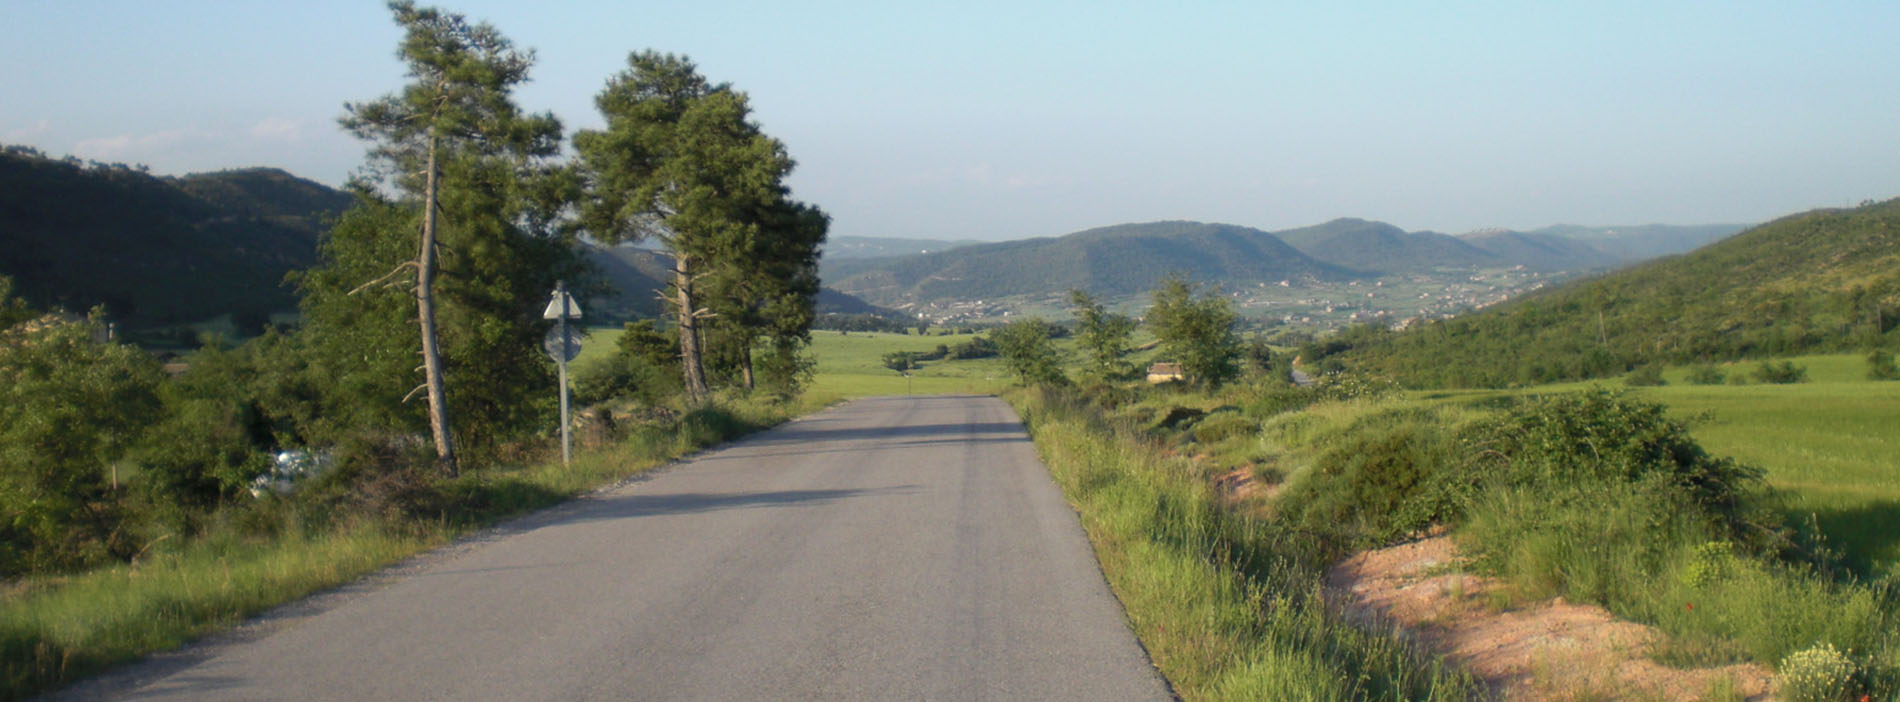 cinesi camins comarcals